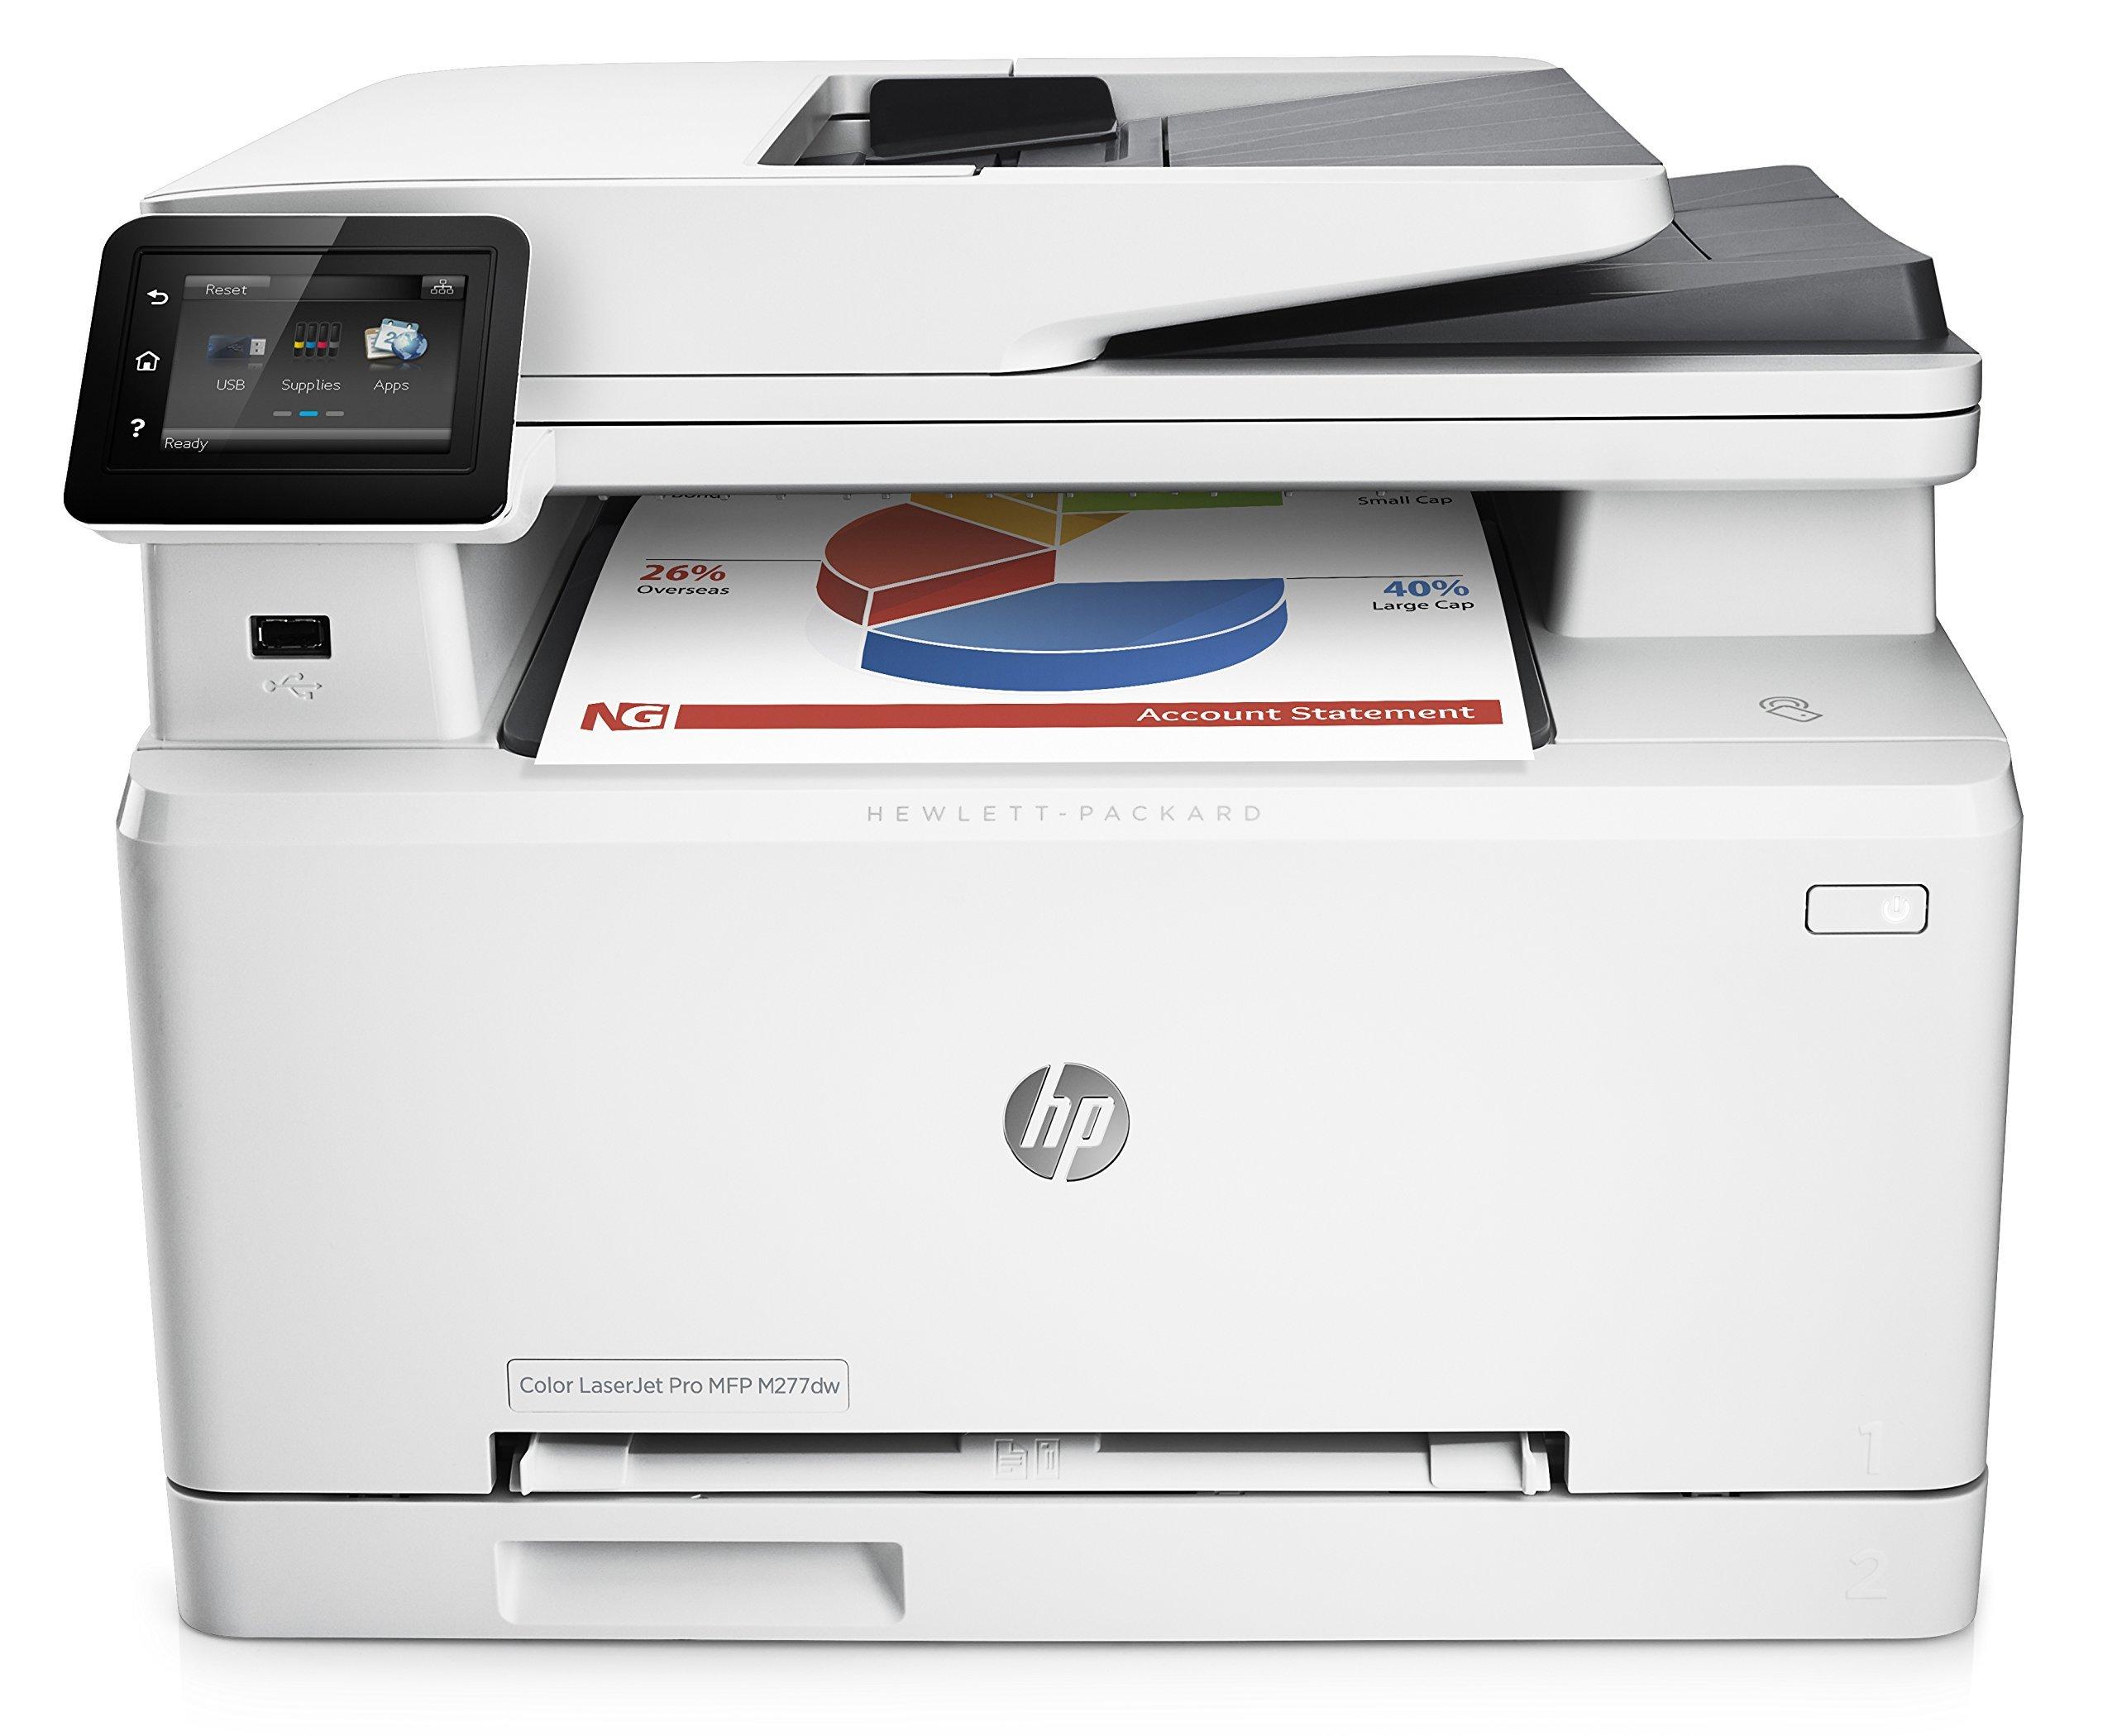 HP LaserJet Pro M277dw Wireless All-in-One Color Printer (Certified Refurbished)